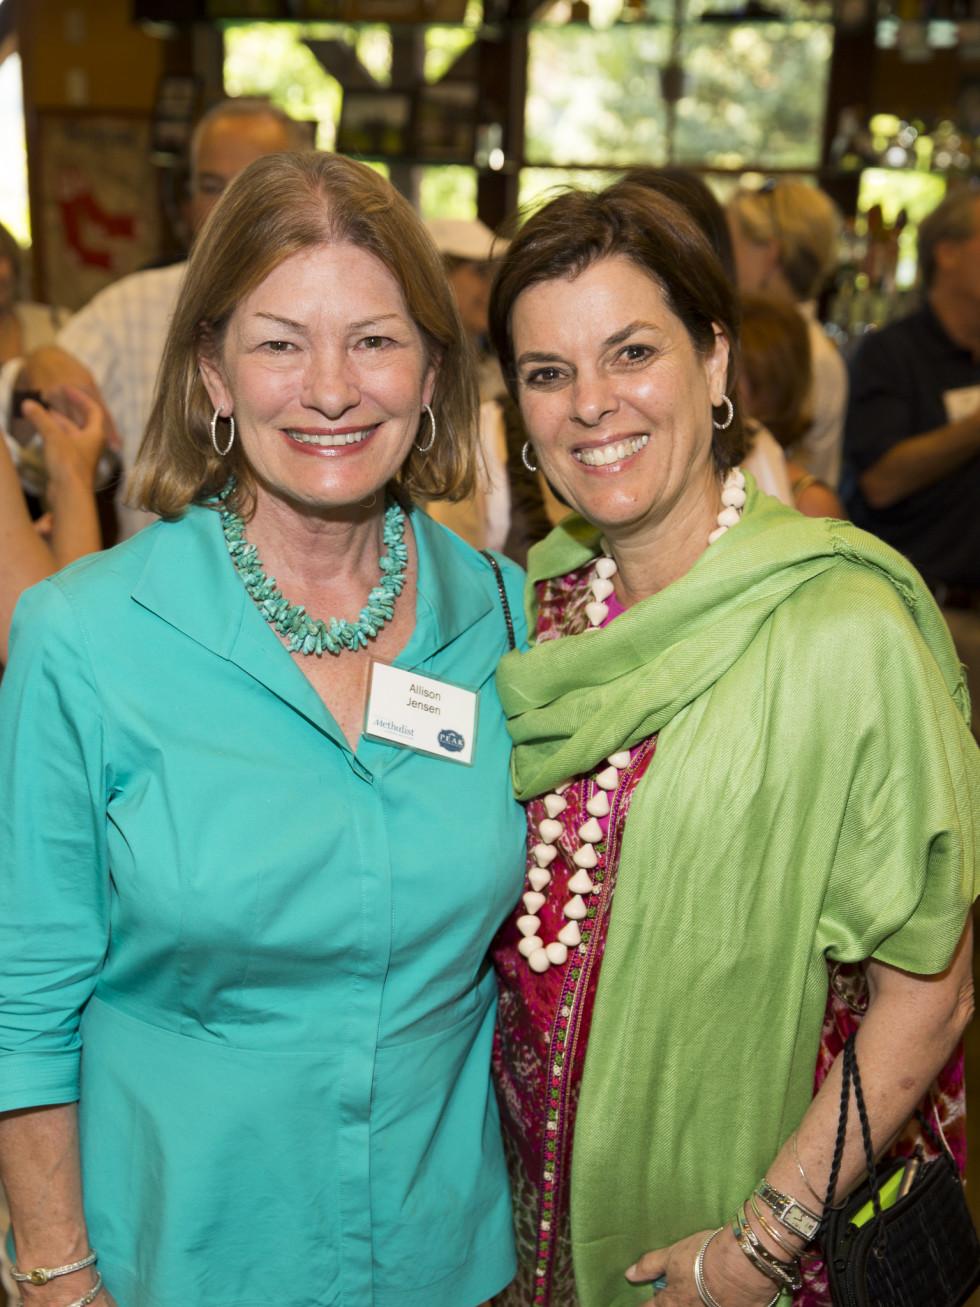 Houston Methodist in Aspen, July 2015, Allison Jensen and Eliza Duncan